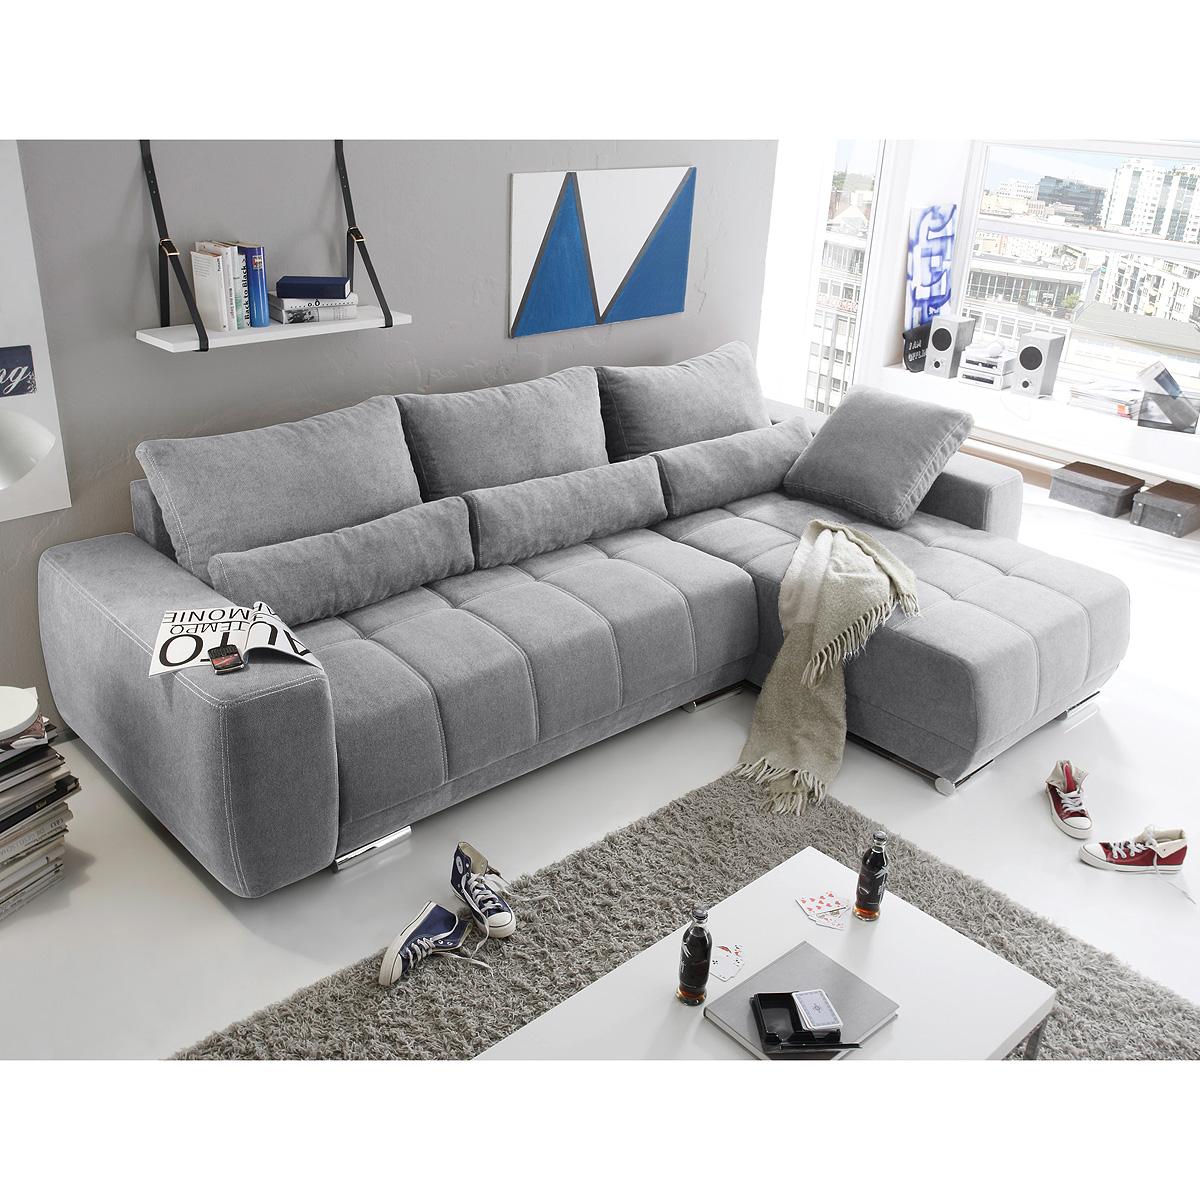 ecksofa lopez sofa wohnlandschaft braun taupe anthrazit. Black Bedroom Furniture Sets. Home Design Ideas